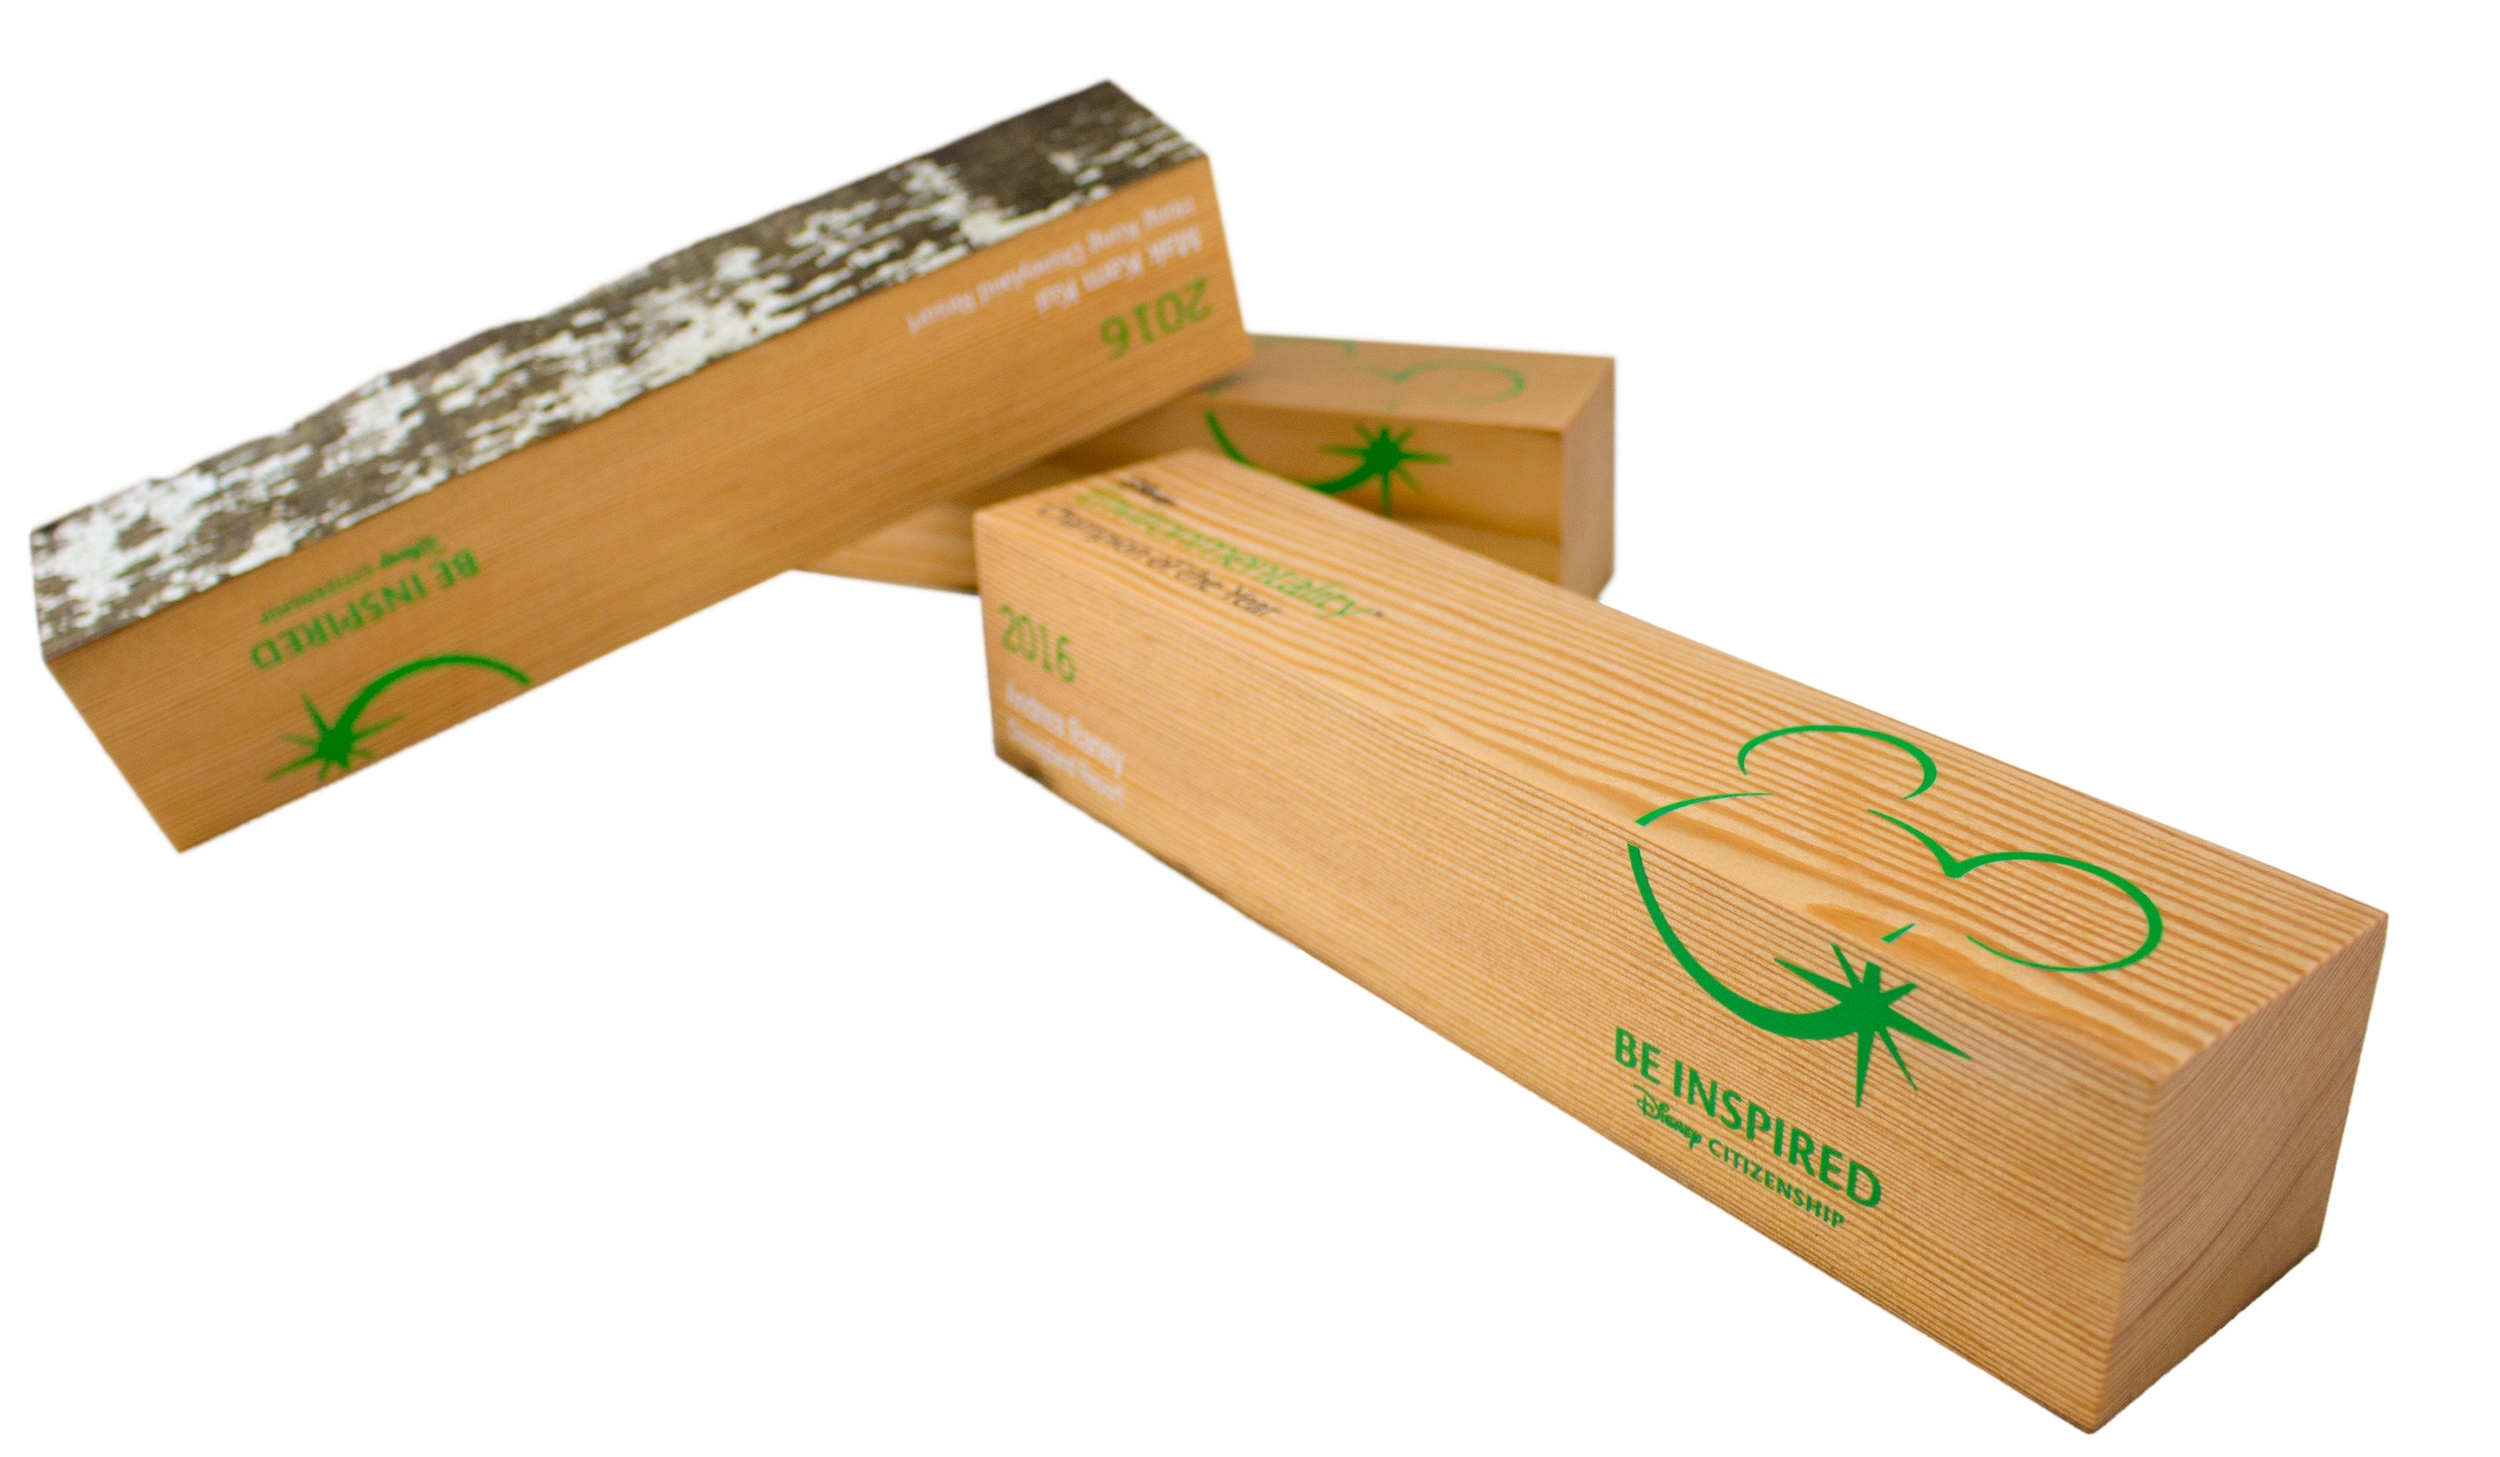 disney custom environmental awards recovered wood